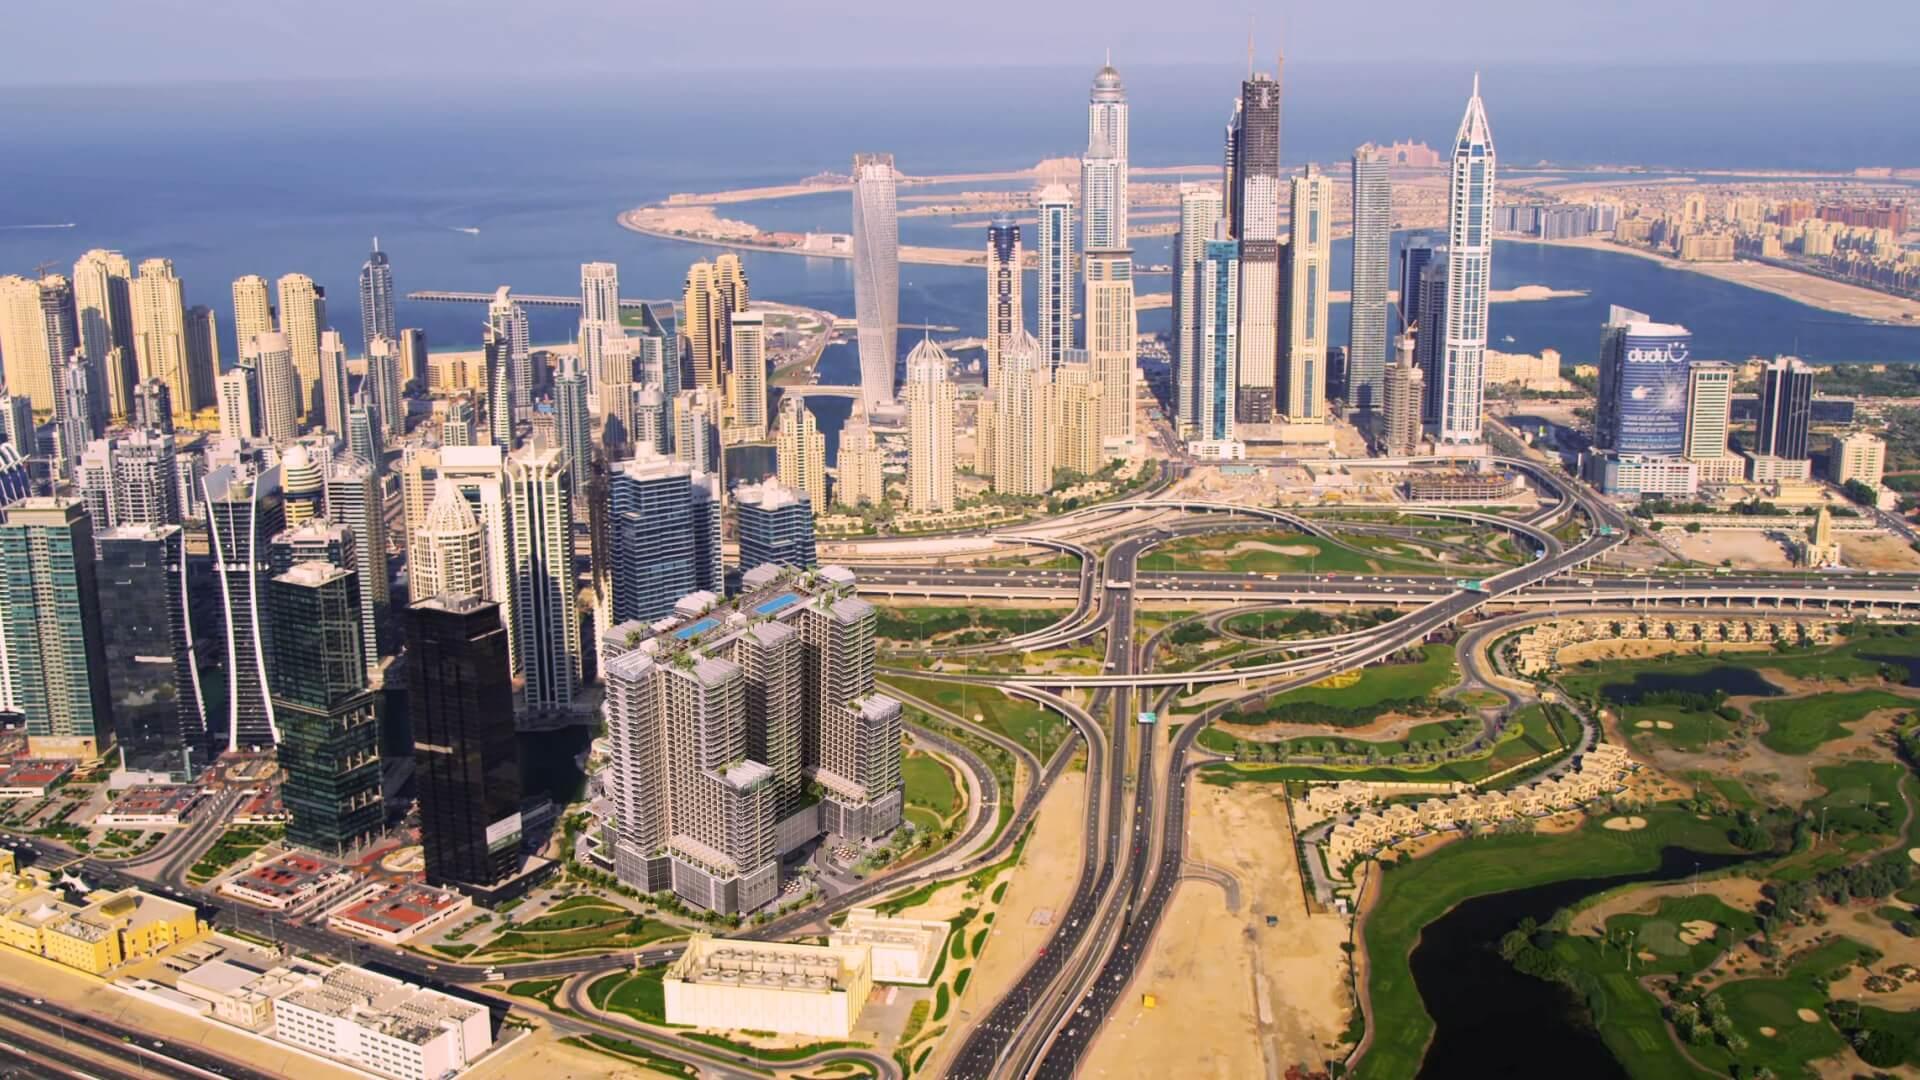 GOLF VIEWS SEVEN CITY, Jumeirah Lake Towers, Dubai, EAU – foto 7